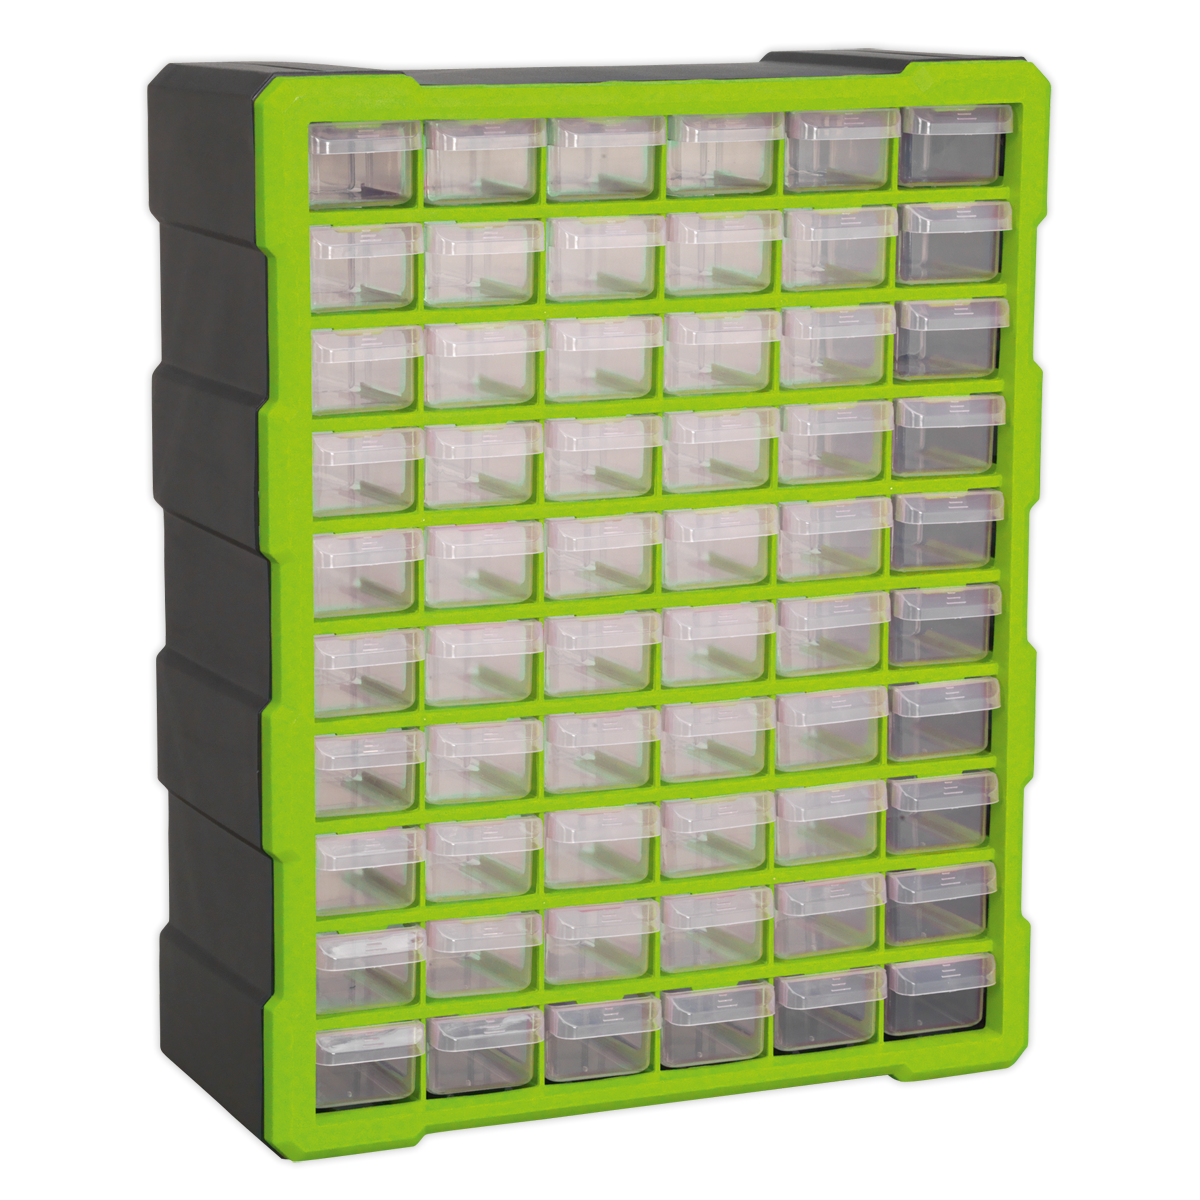 SEALEY Cabinet Box 60 Drawer Hi-Vis Green